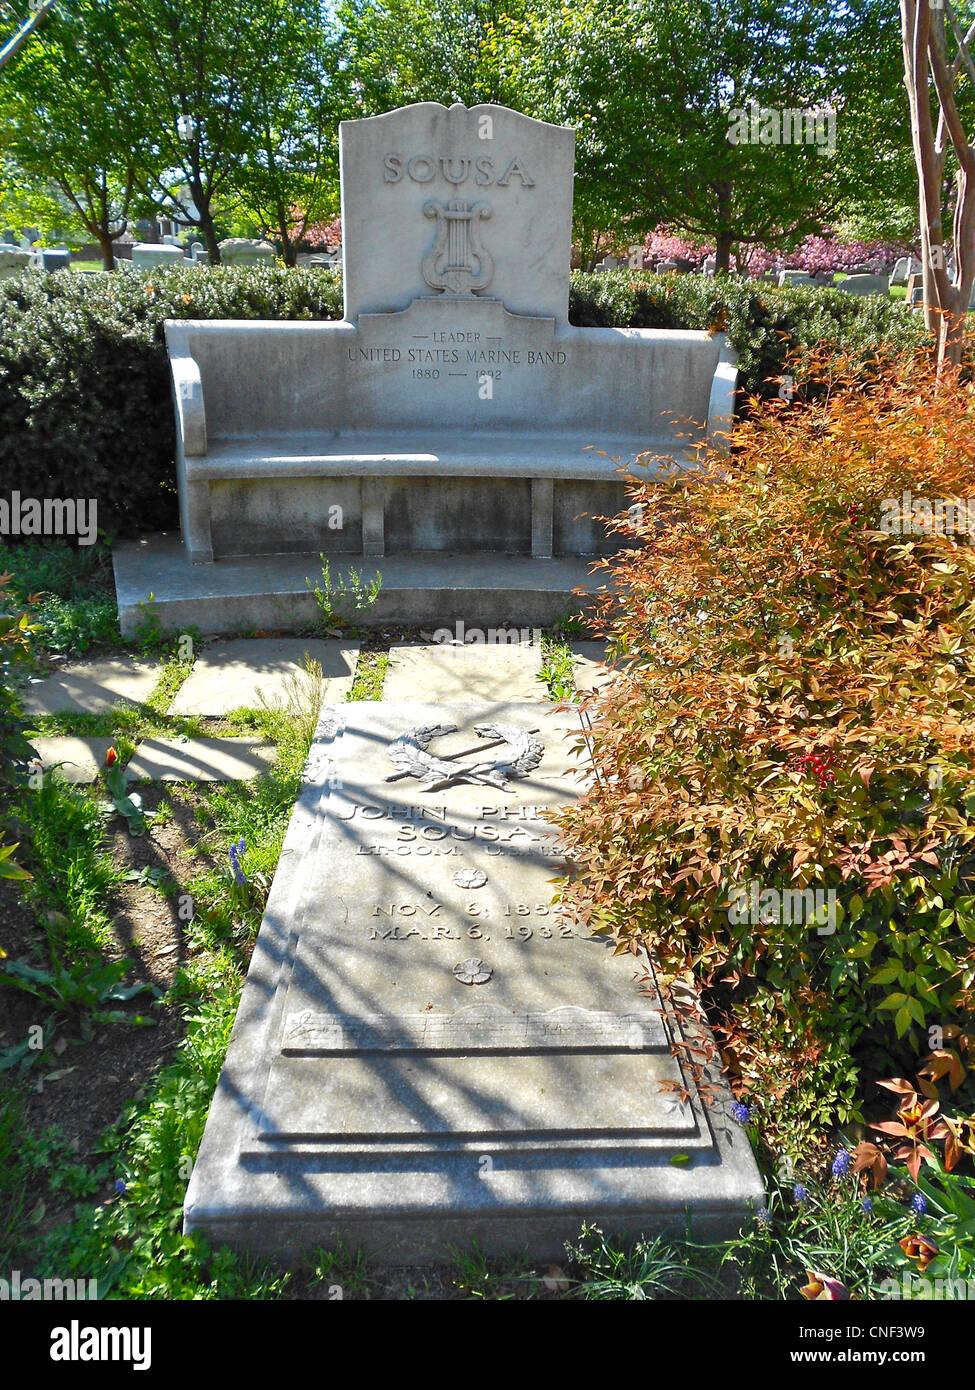 Grave of John Phillip Sousa in the Congressional Cemetery, Washington, DC. - Stock Image